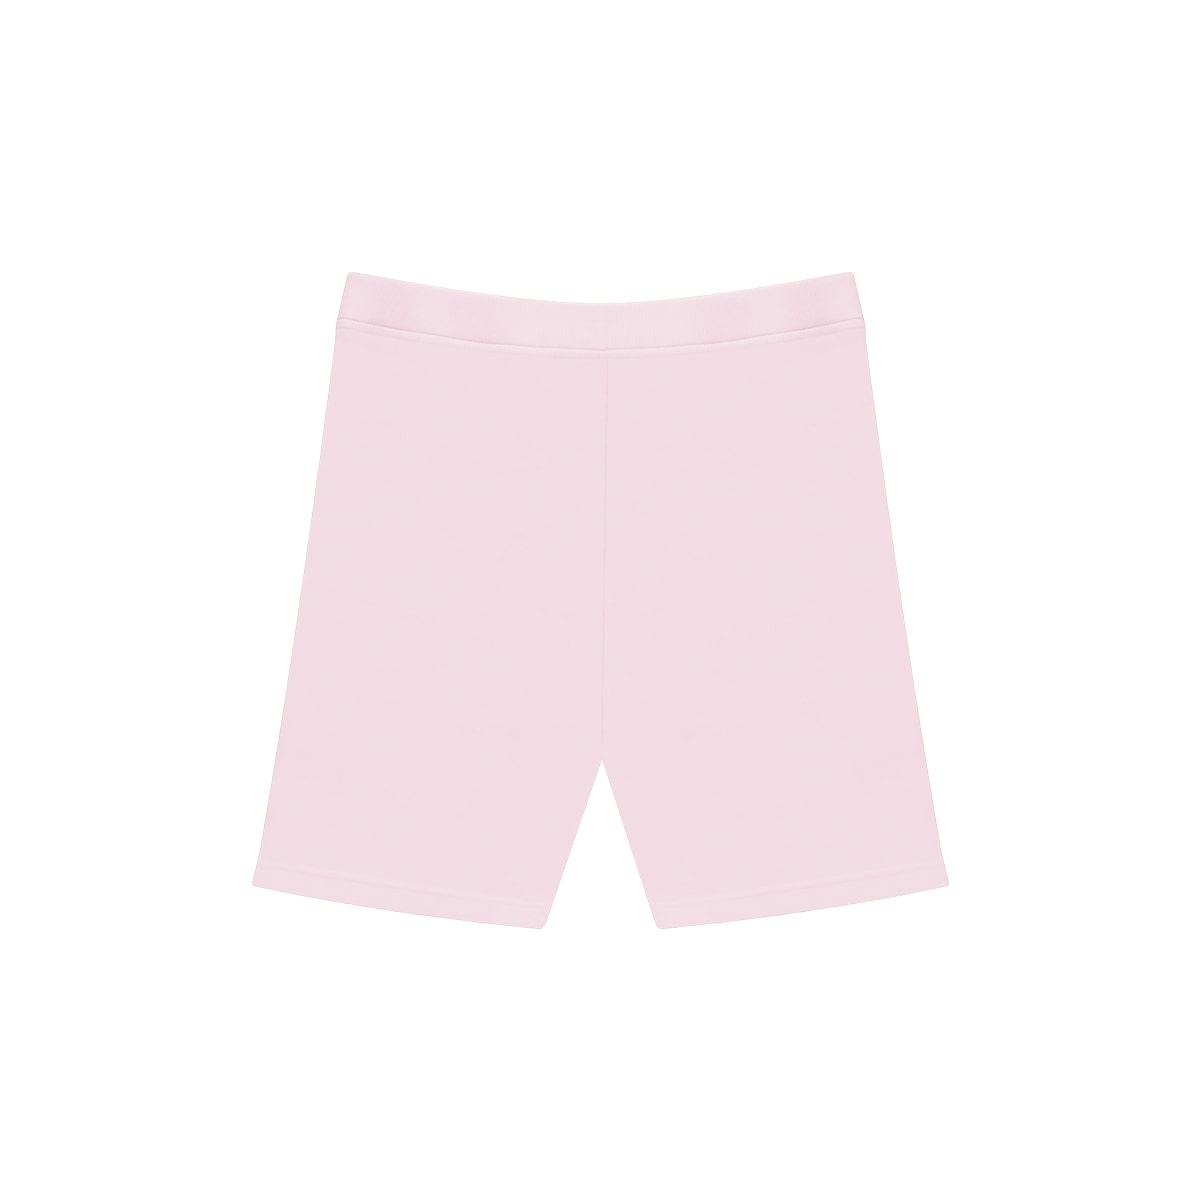 Pink Bike Short